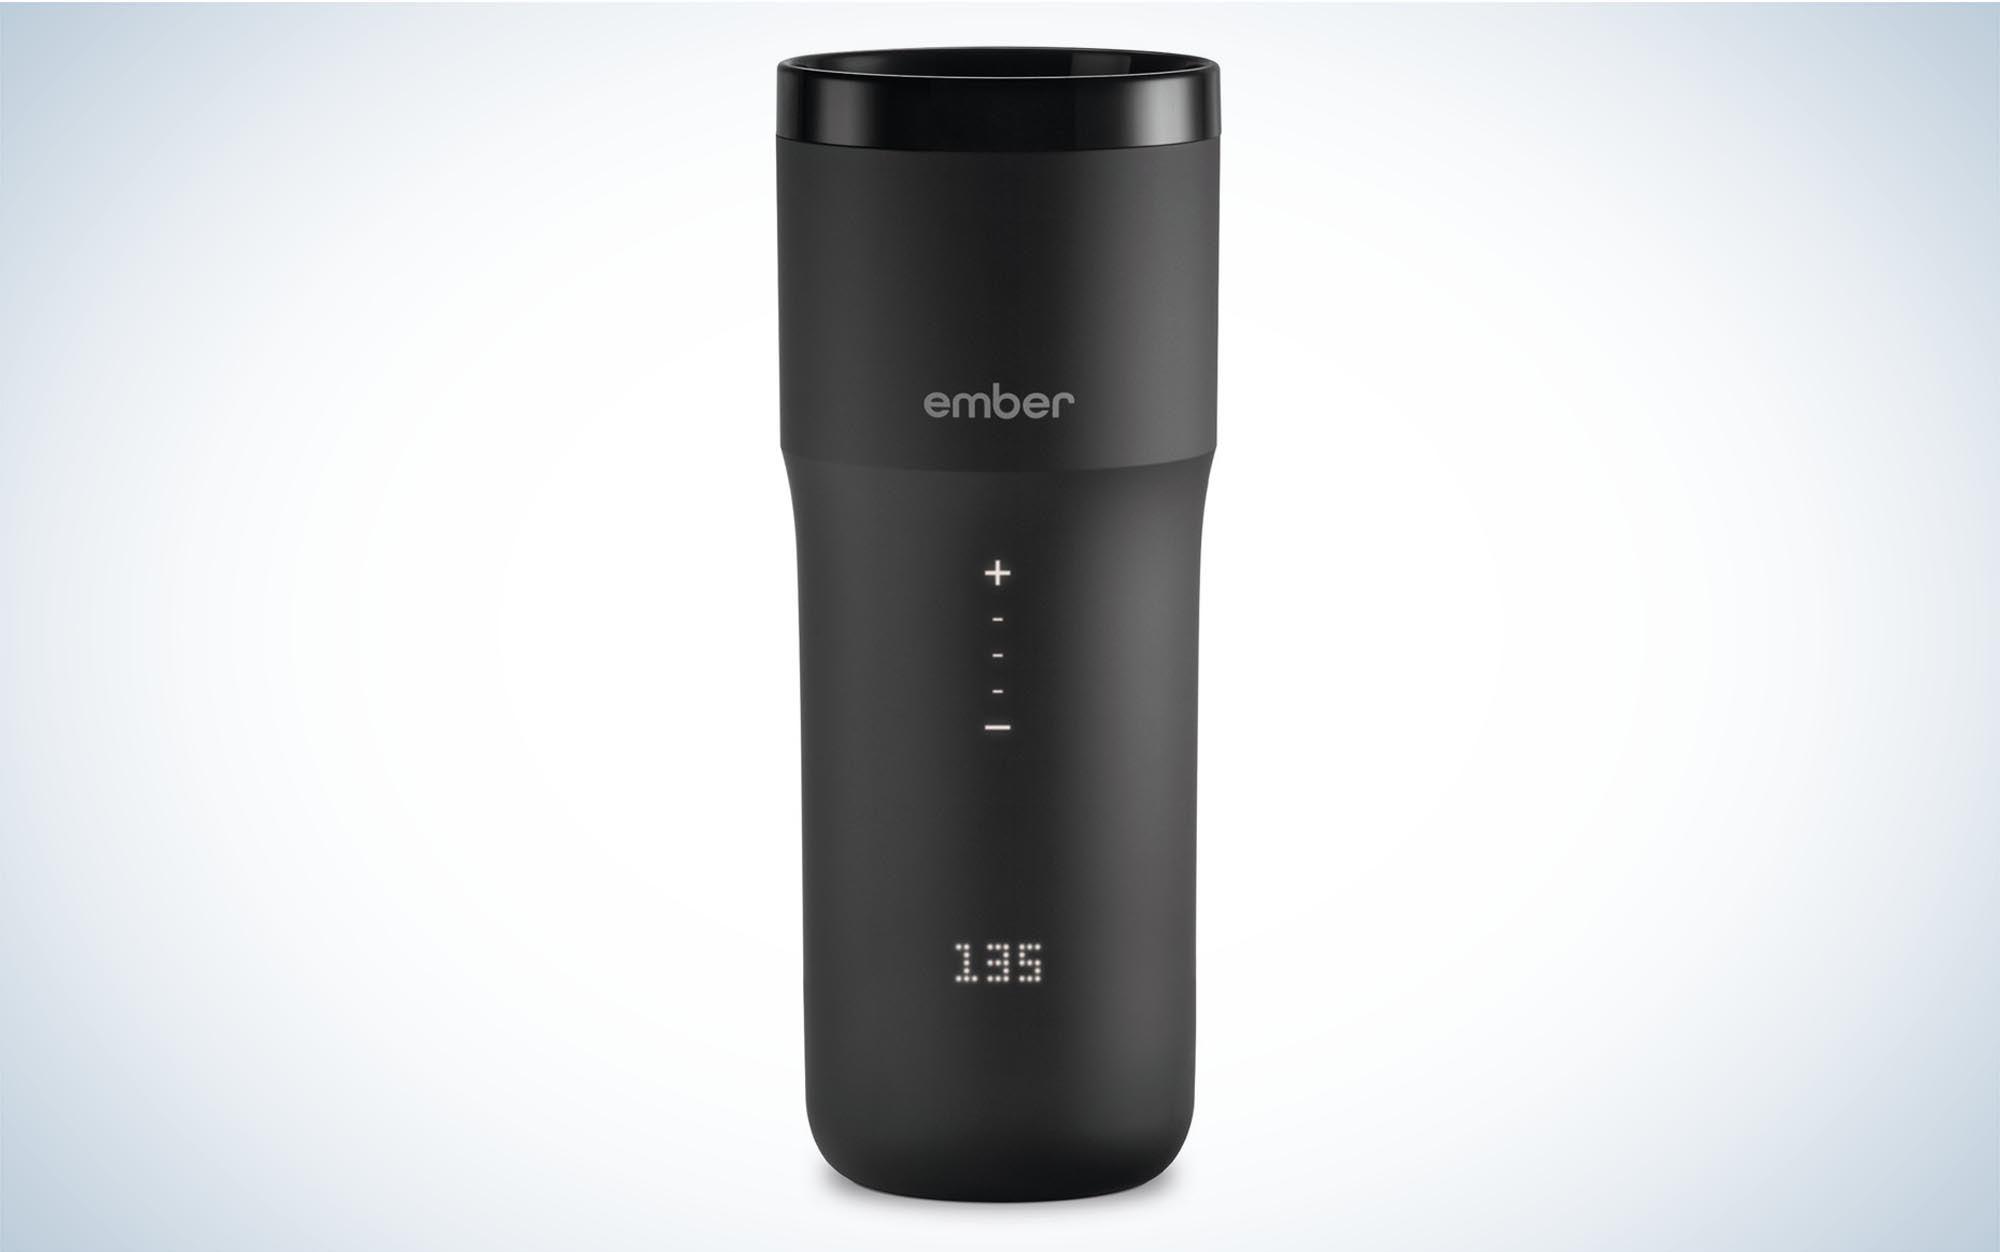 Ember's Temperature Control Travel Mug 2